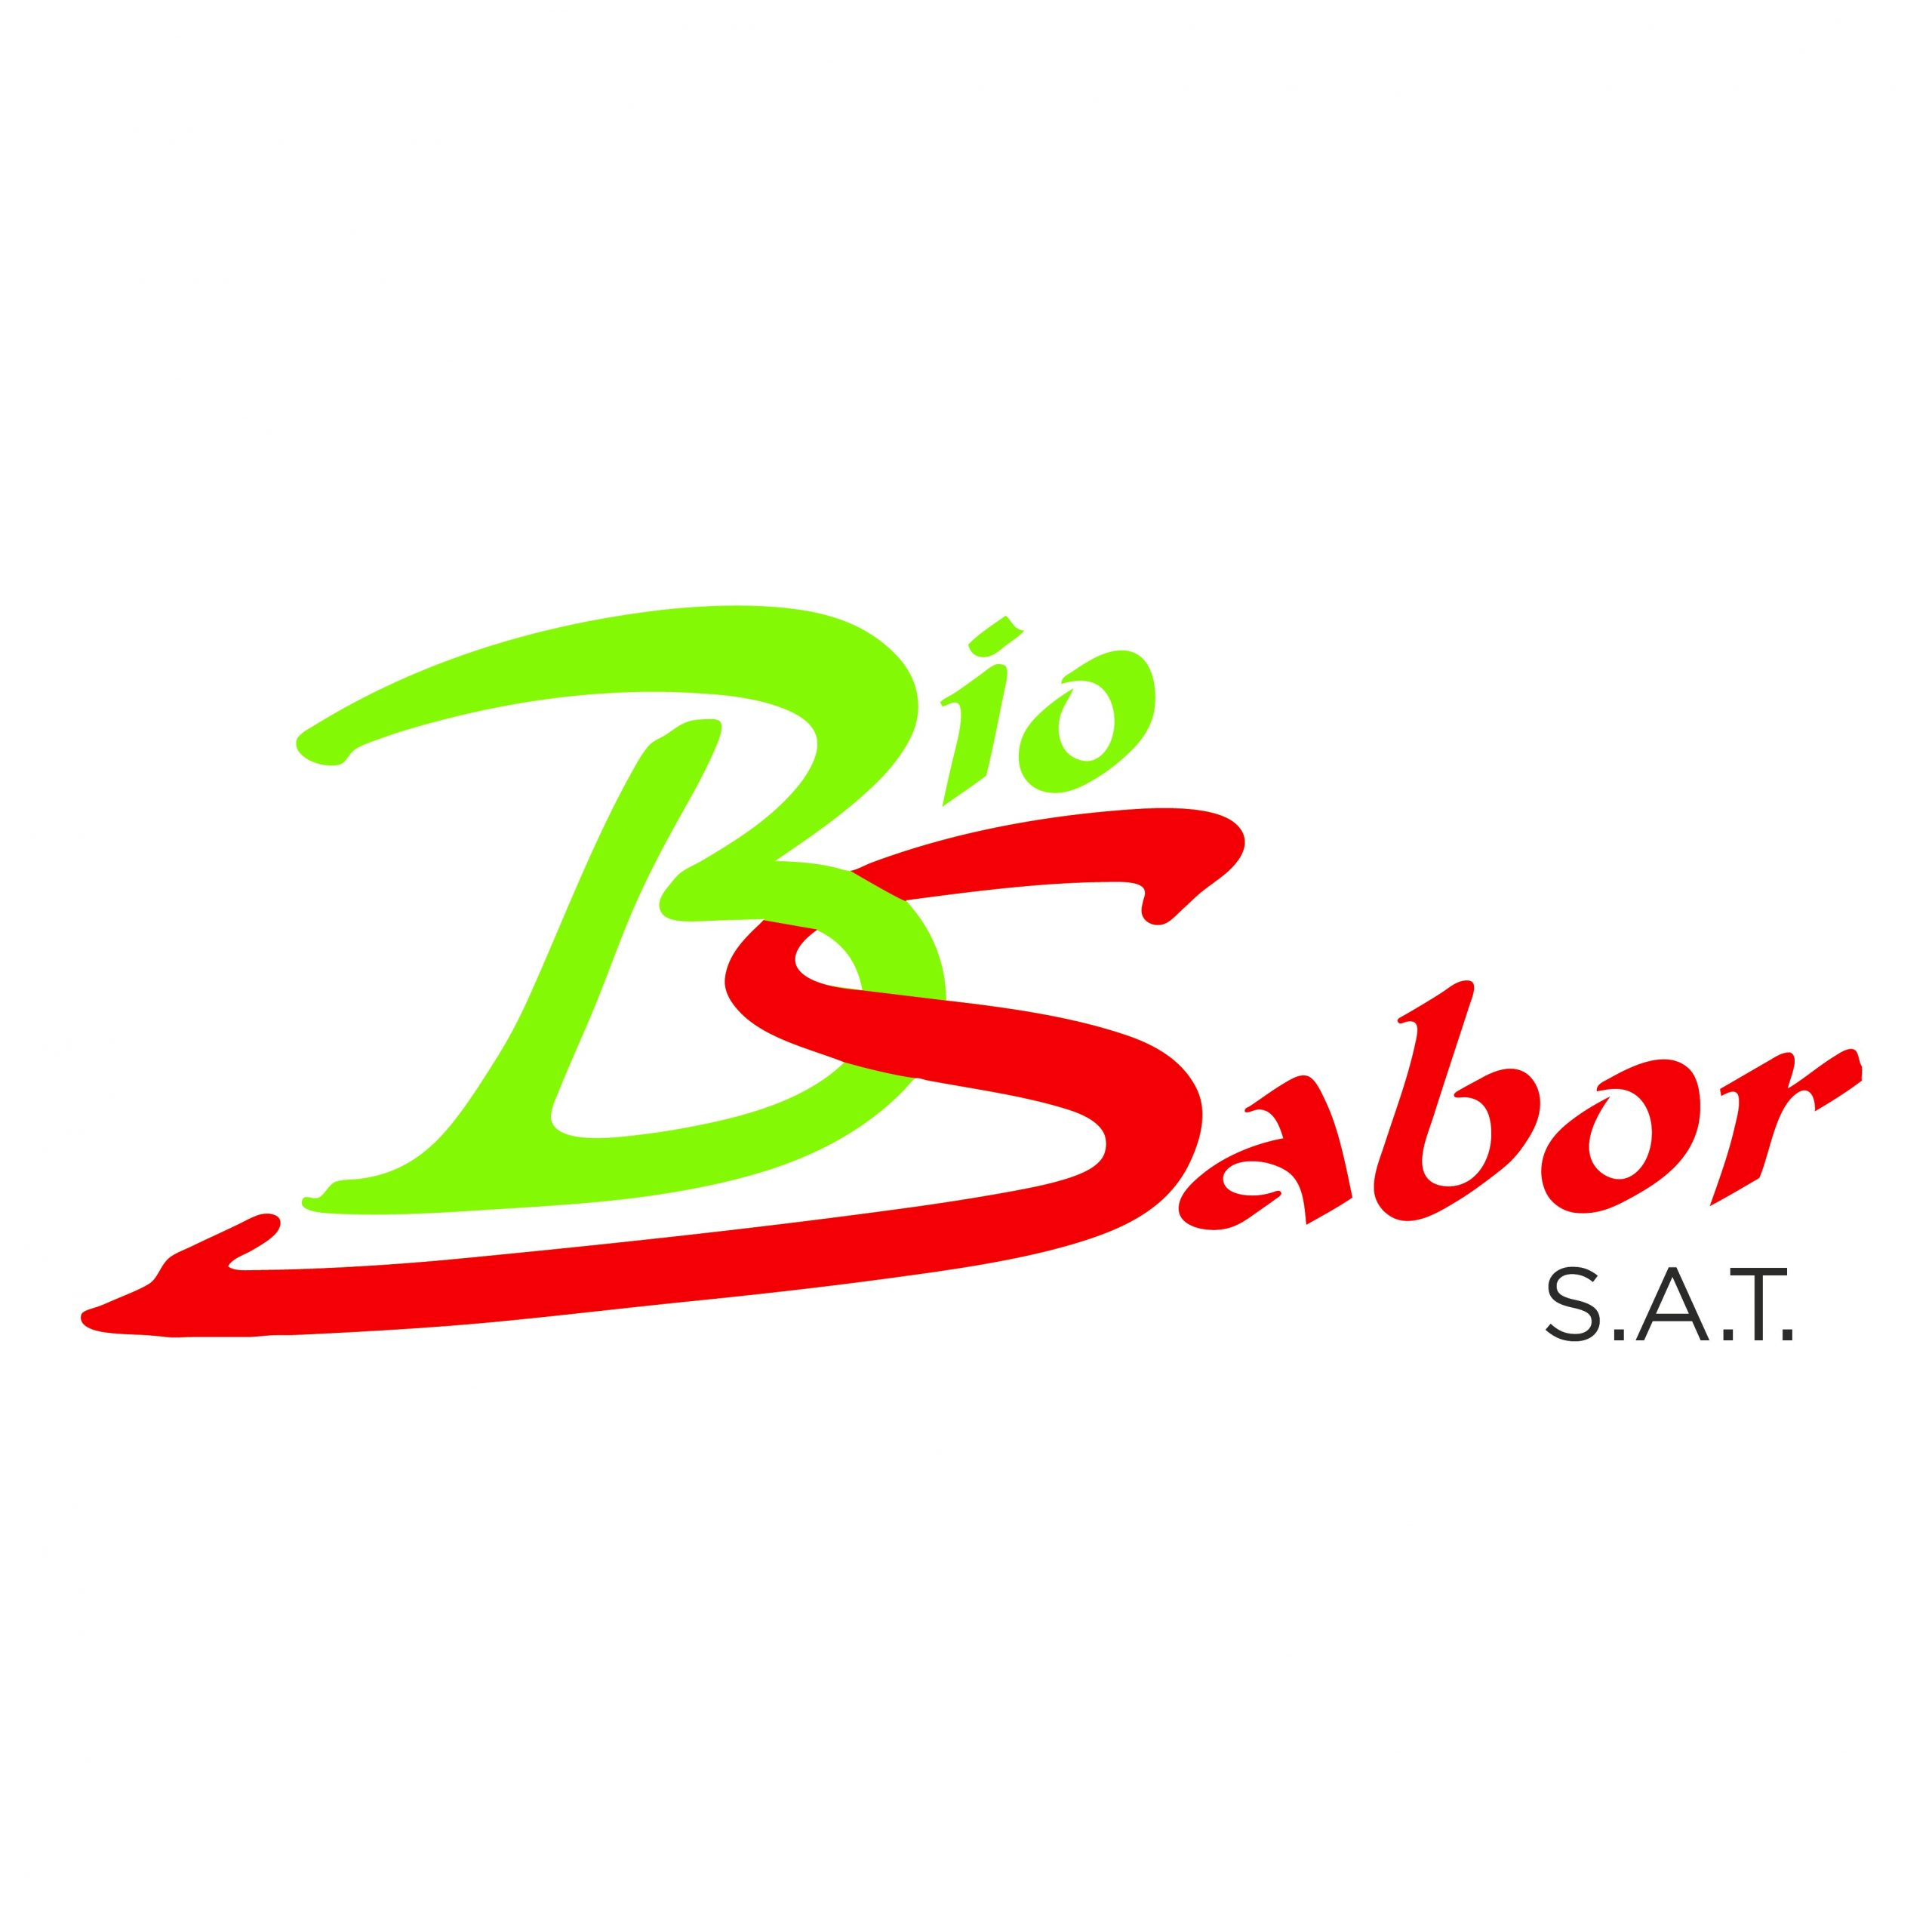 BIOSABOR SAT